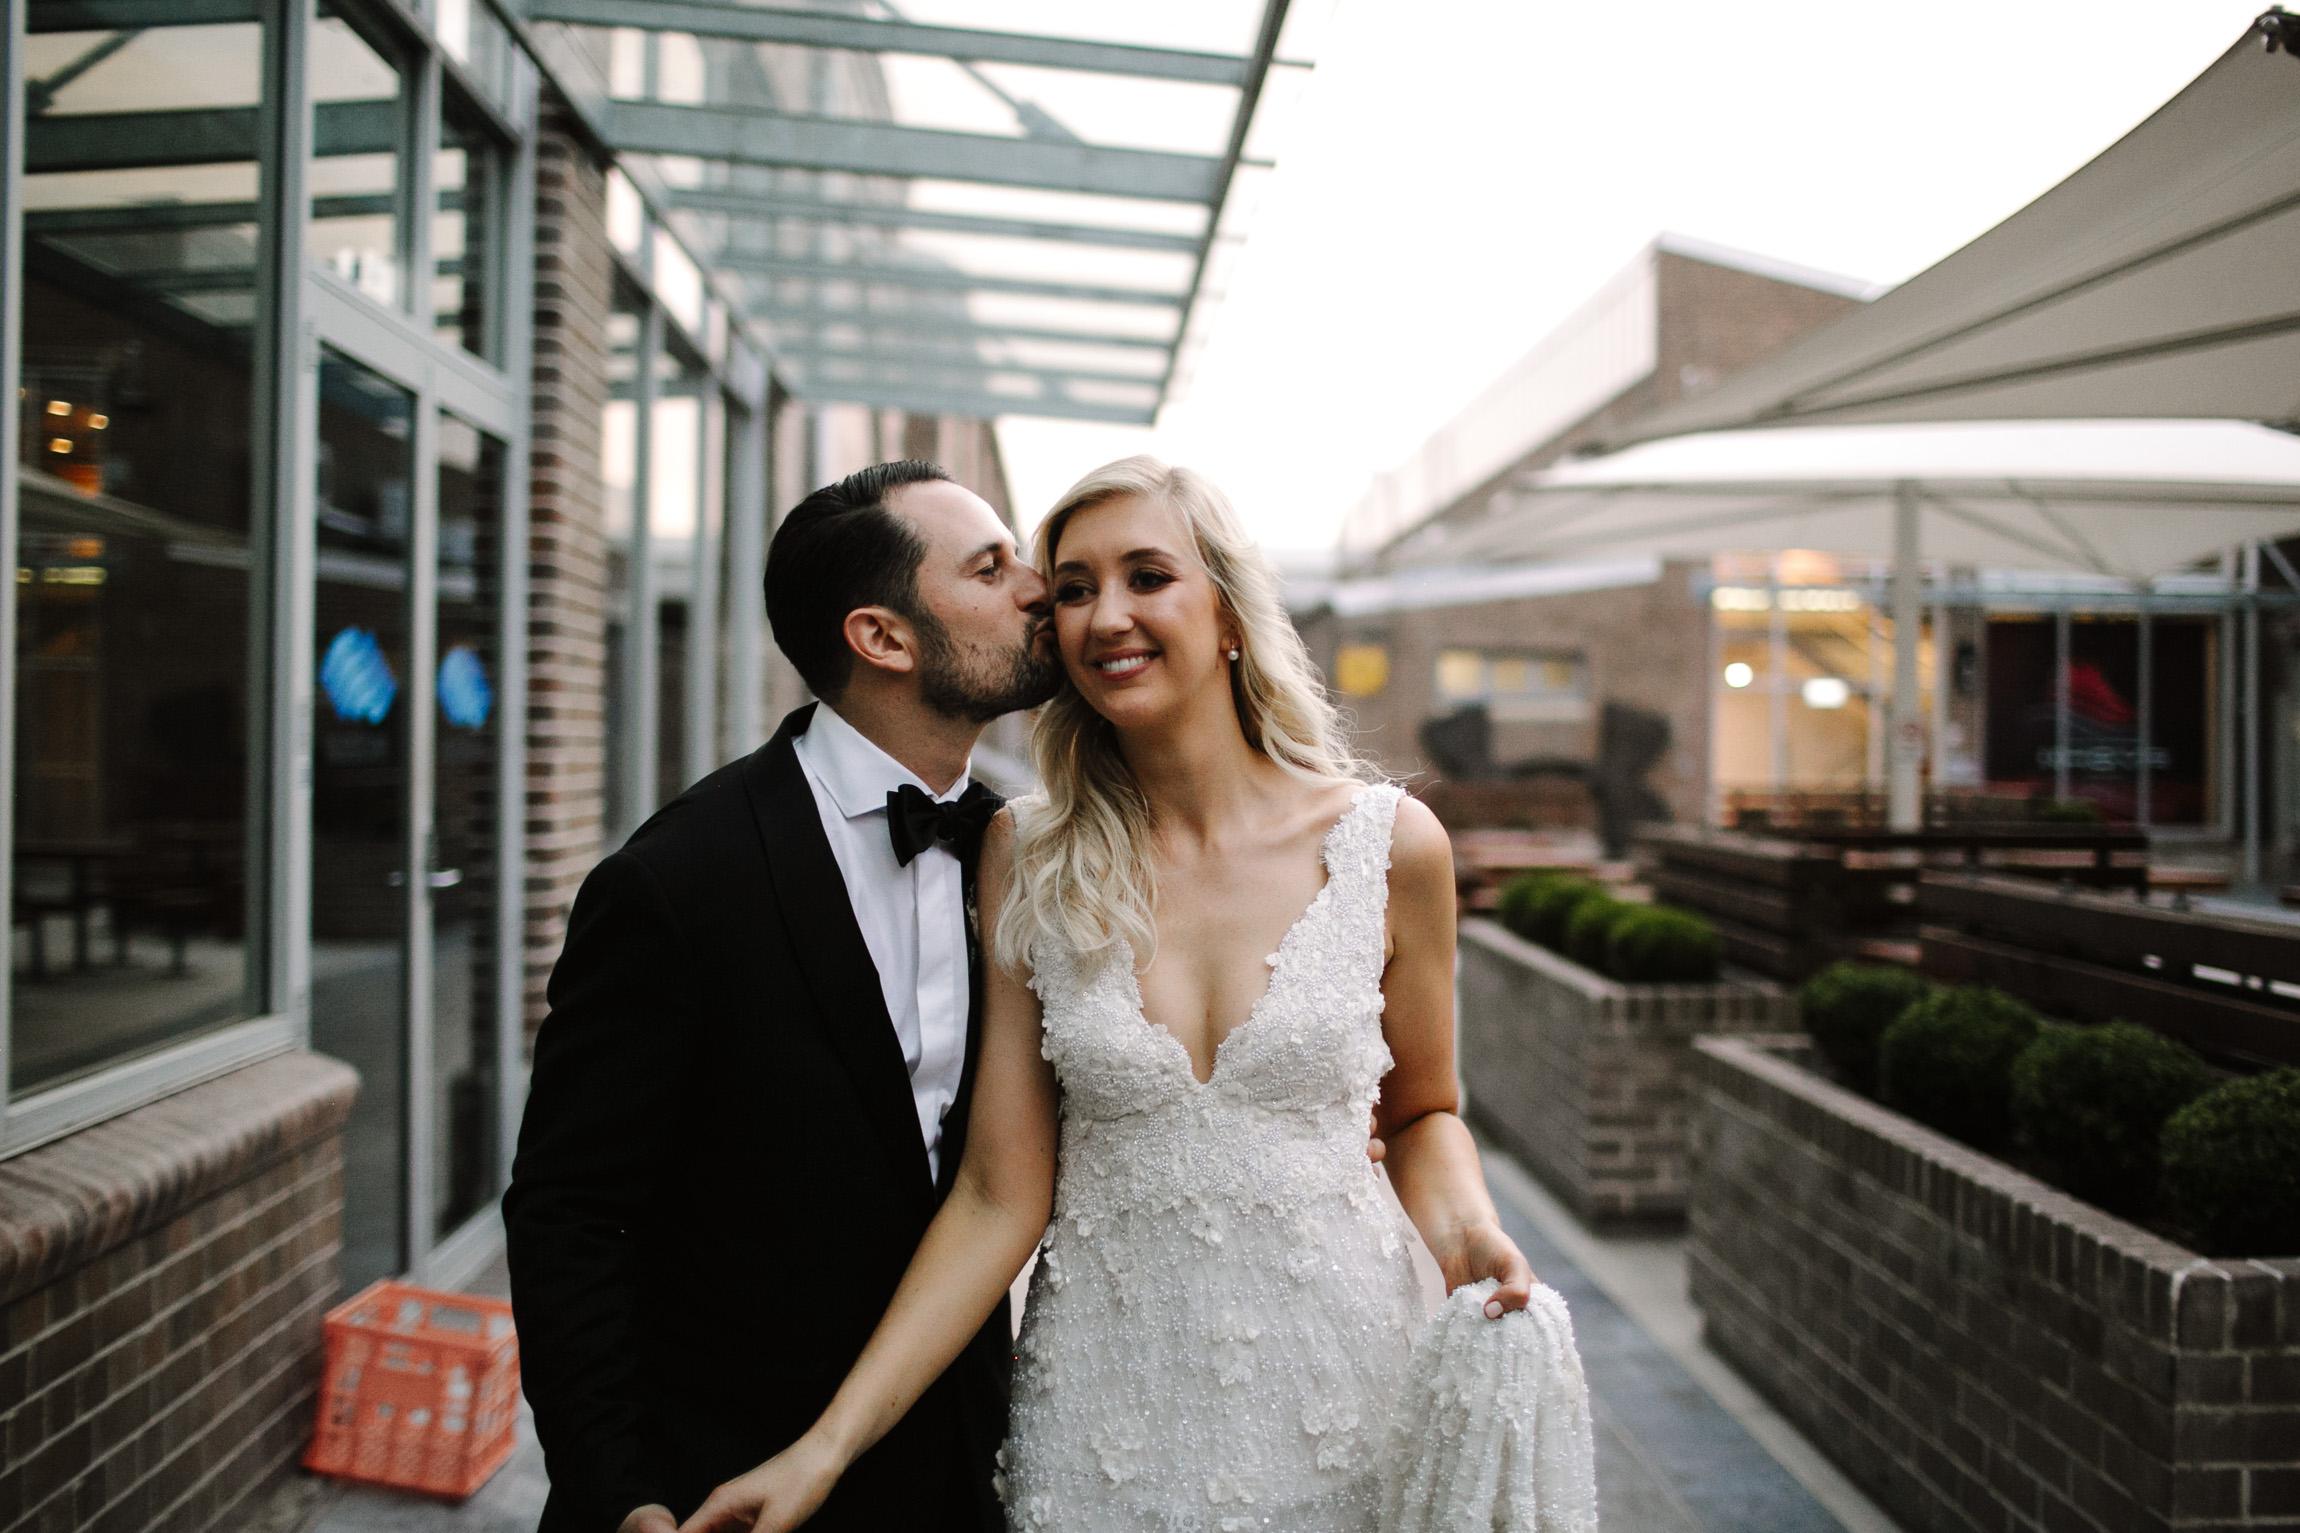 180223_justinaaron_wedding_charlotte_david_h-219.jpg